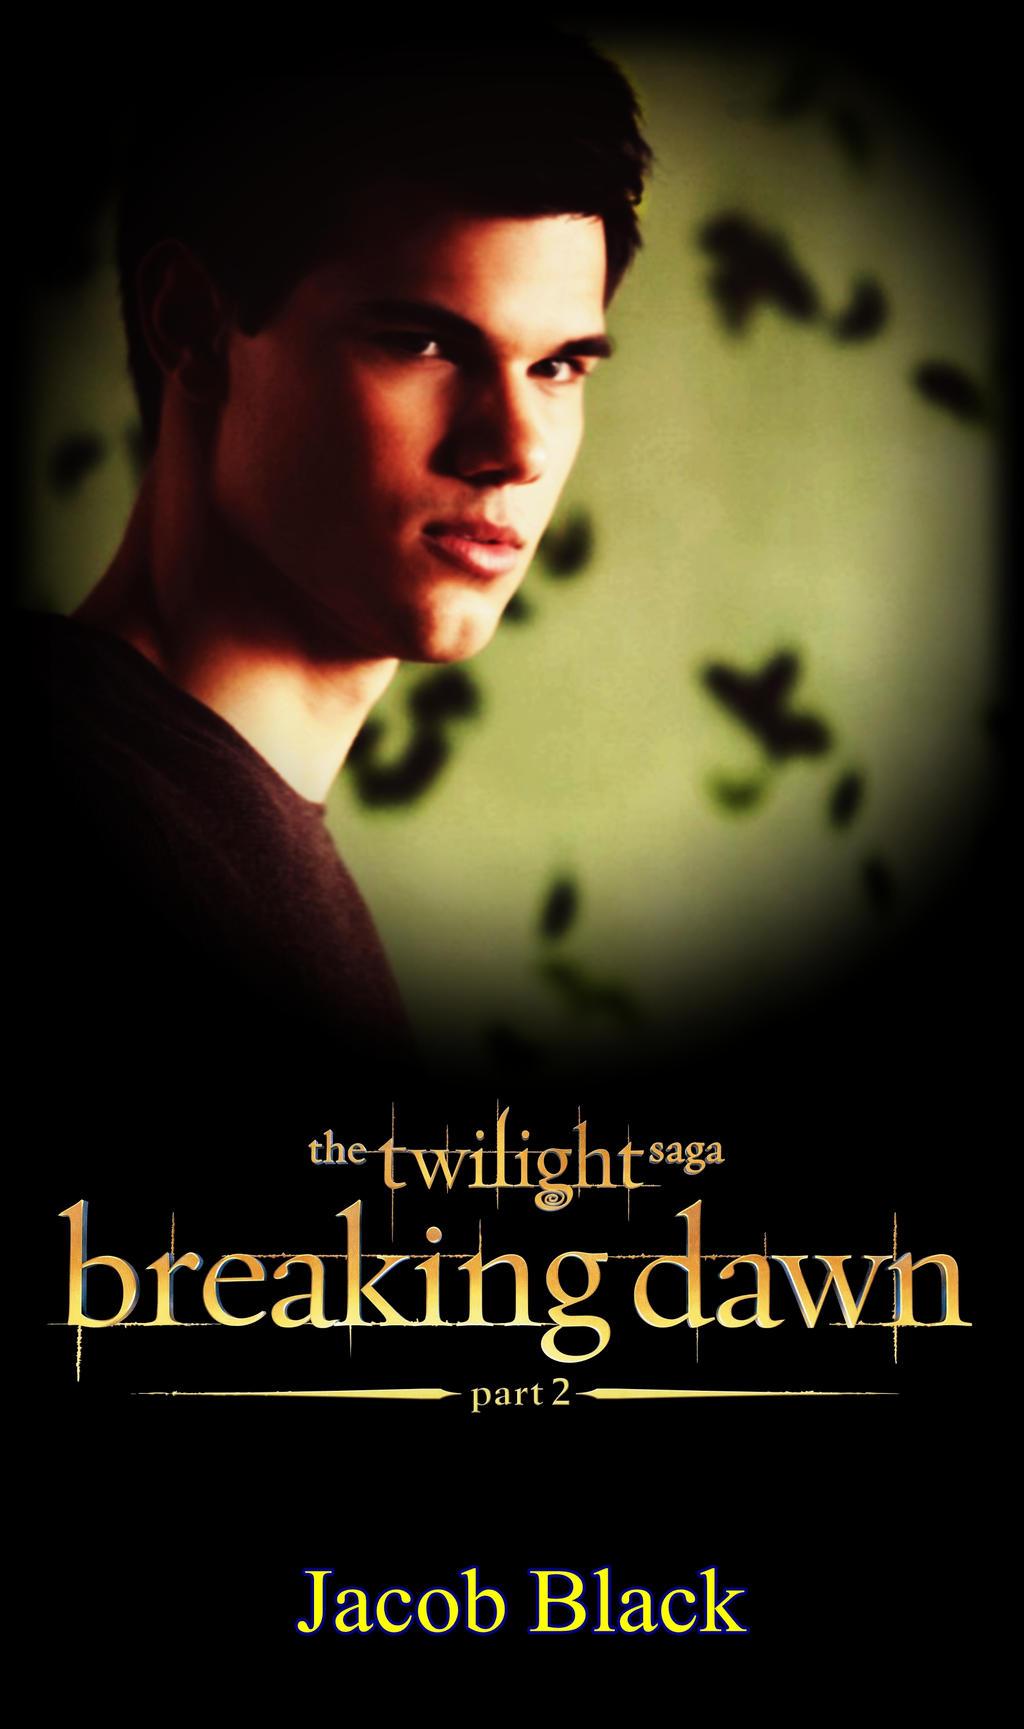 Breaking Dawn Part 2 PosterJacob Black Breaking Dawn Part 2